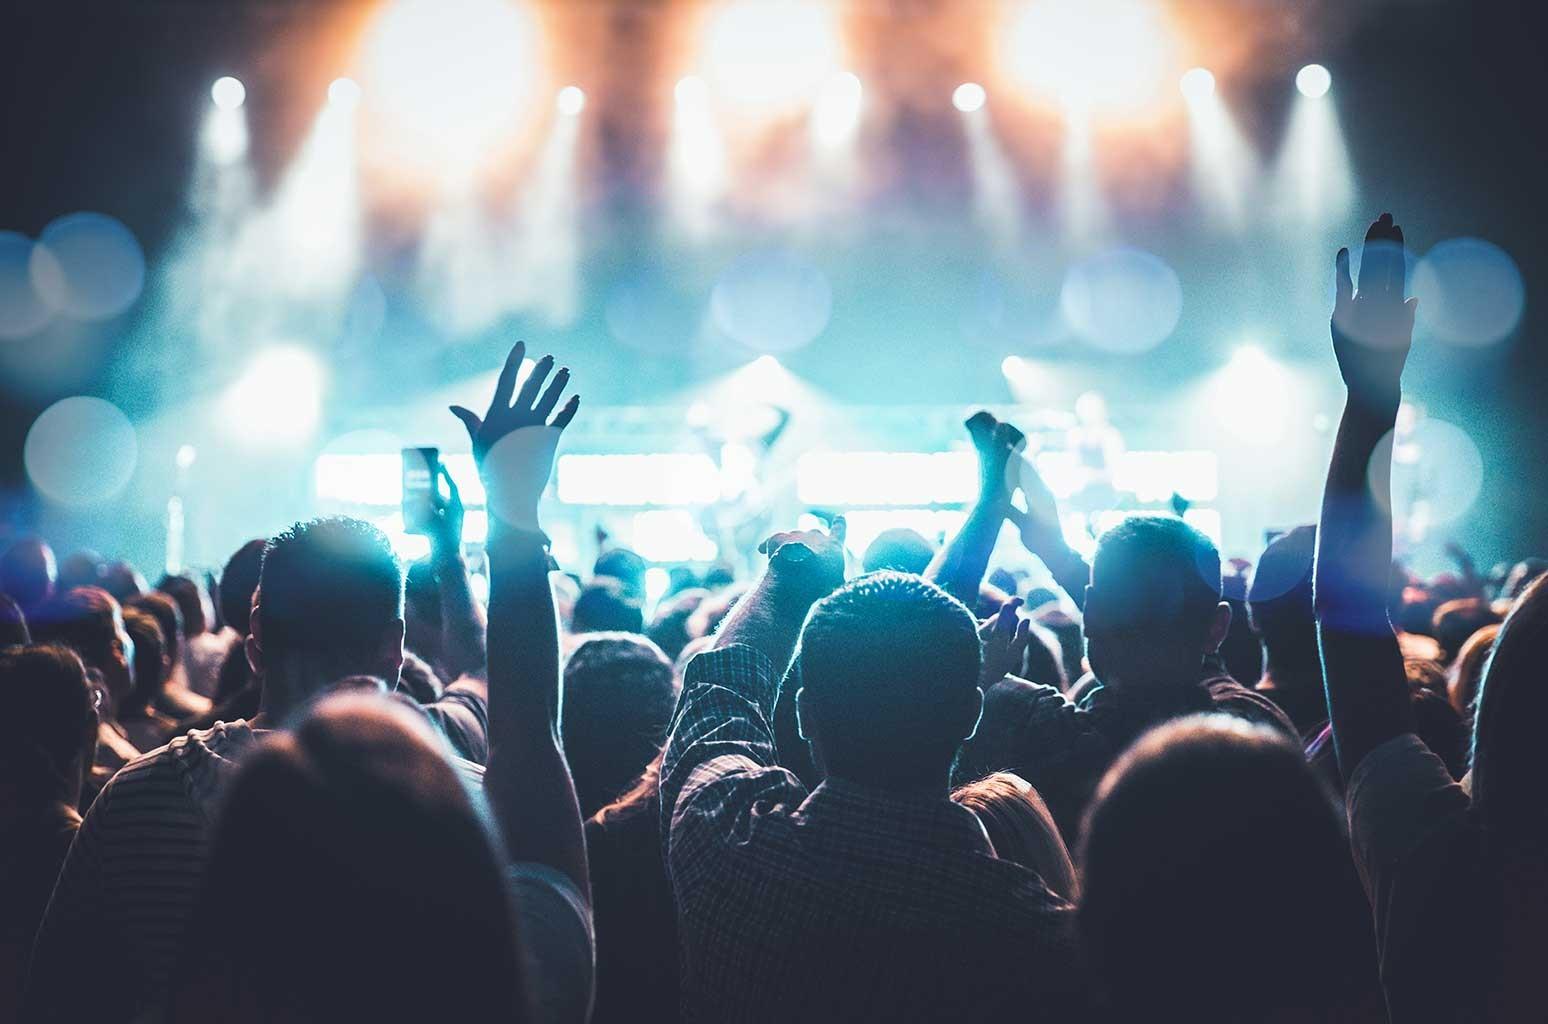 Nightlife music venue